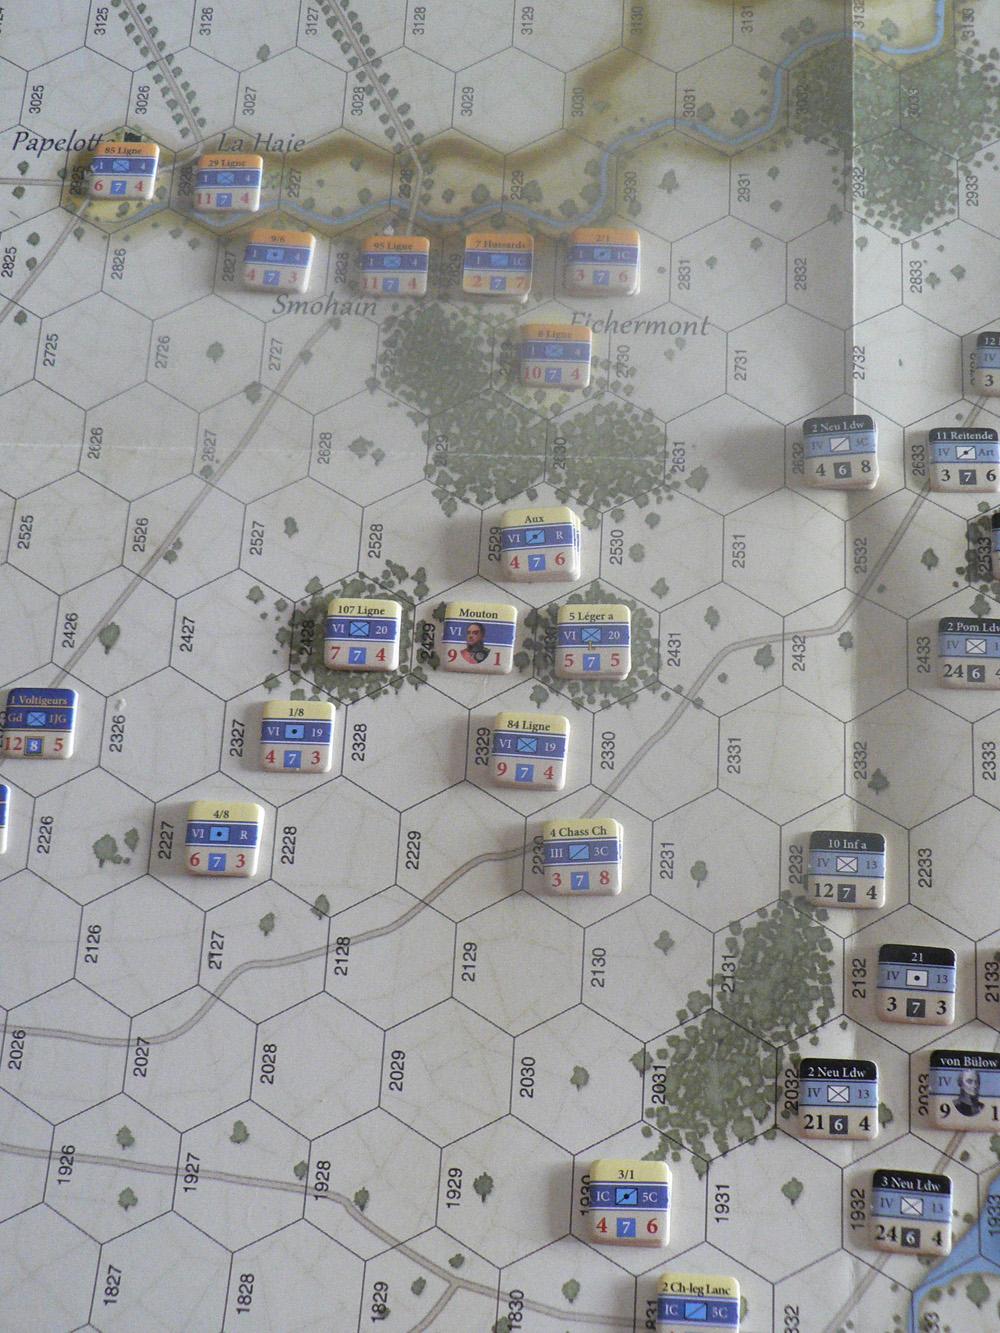 [CR] Fallen Eagle la bataille 5nHzs8